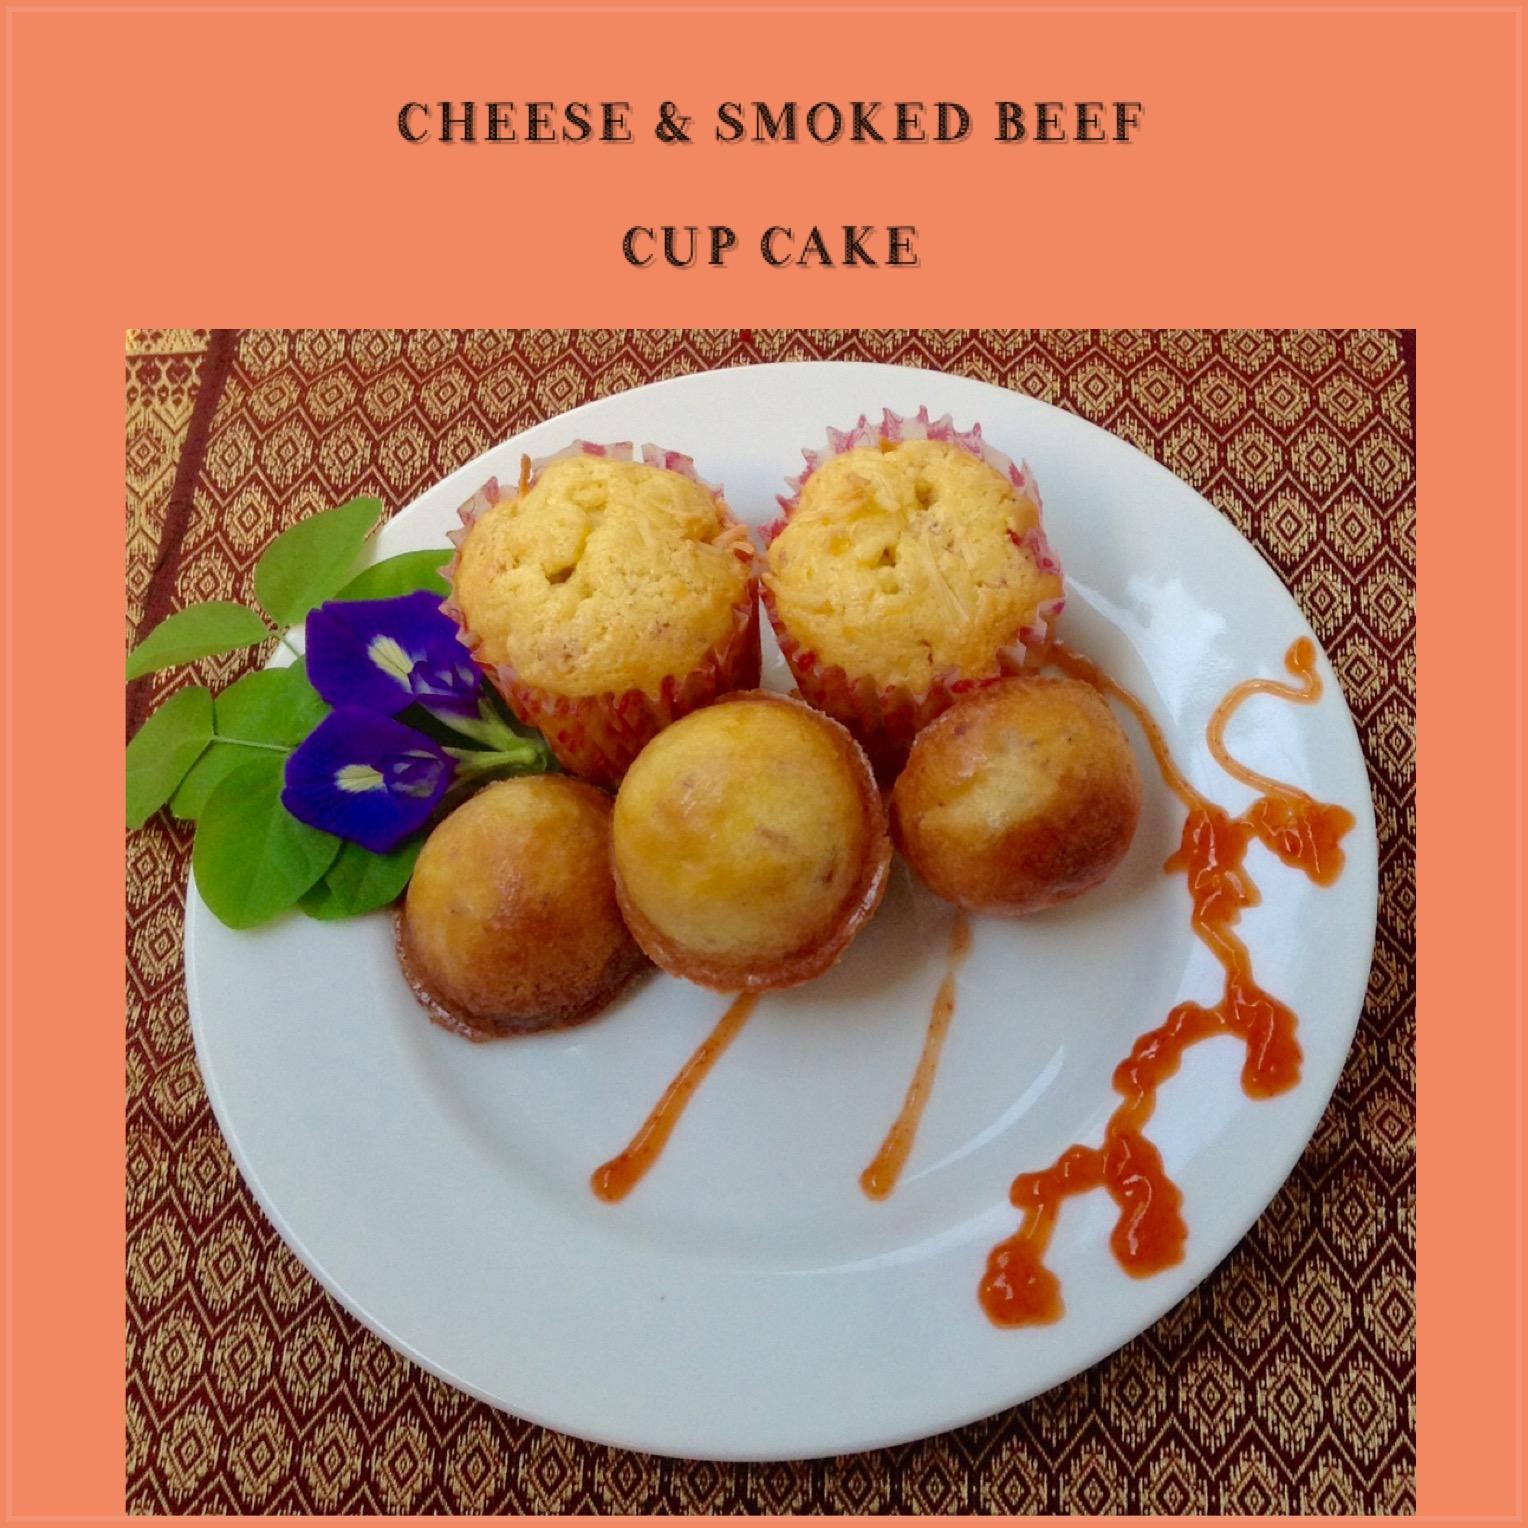 Resep Cheese & Smoked Beef Cupcake